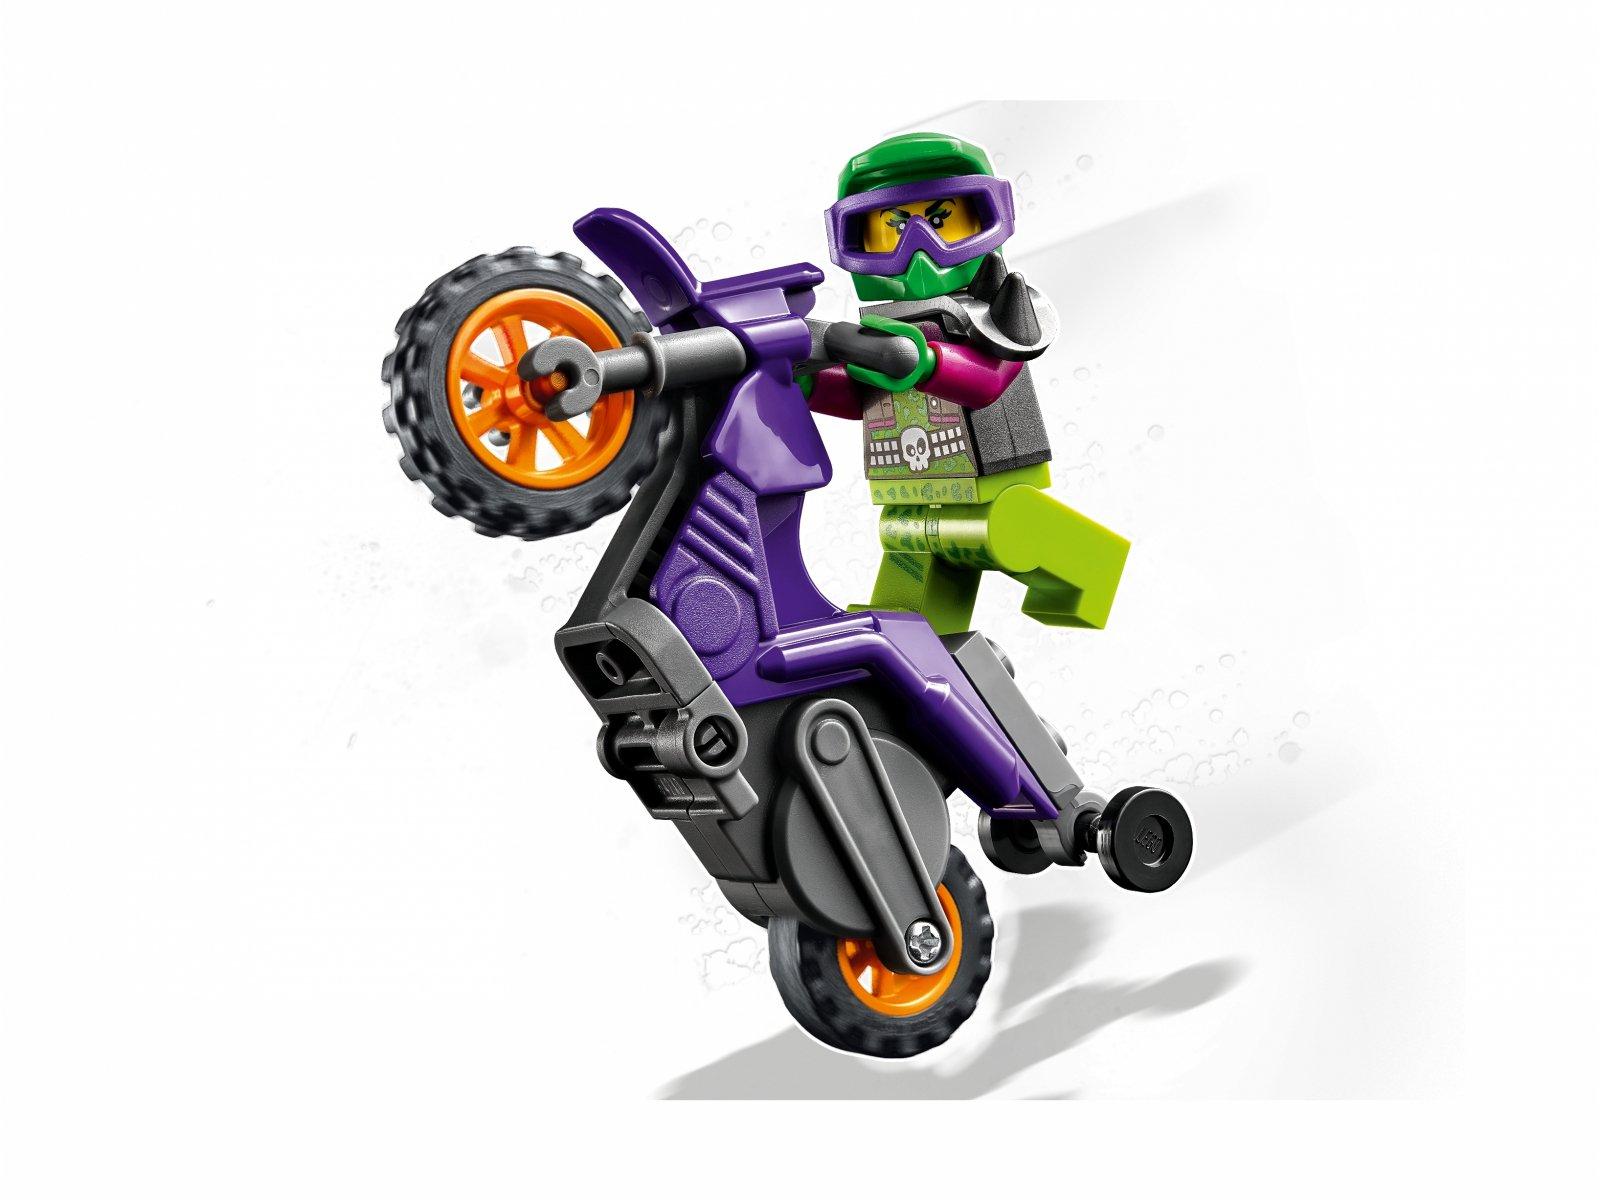 LEGO City Wheelie na motocyklu kaskaderskim 60296